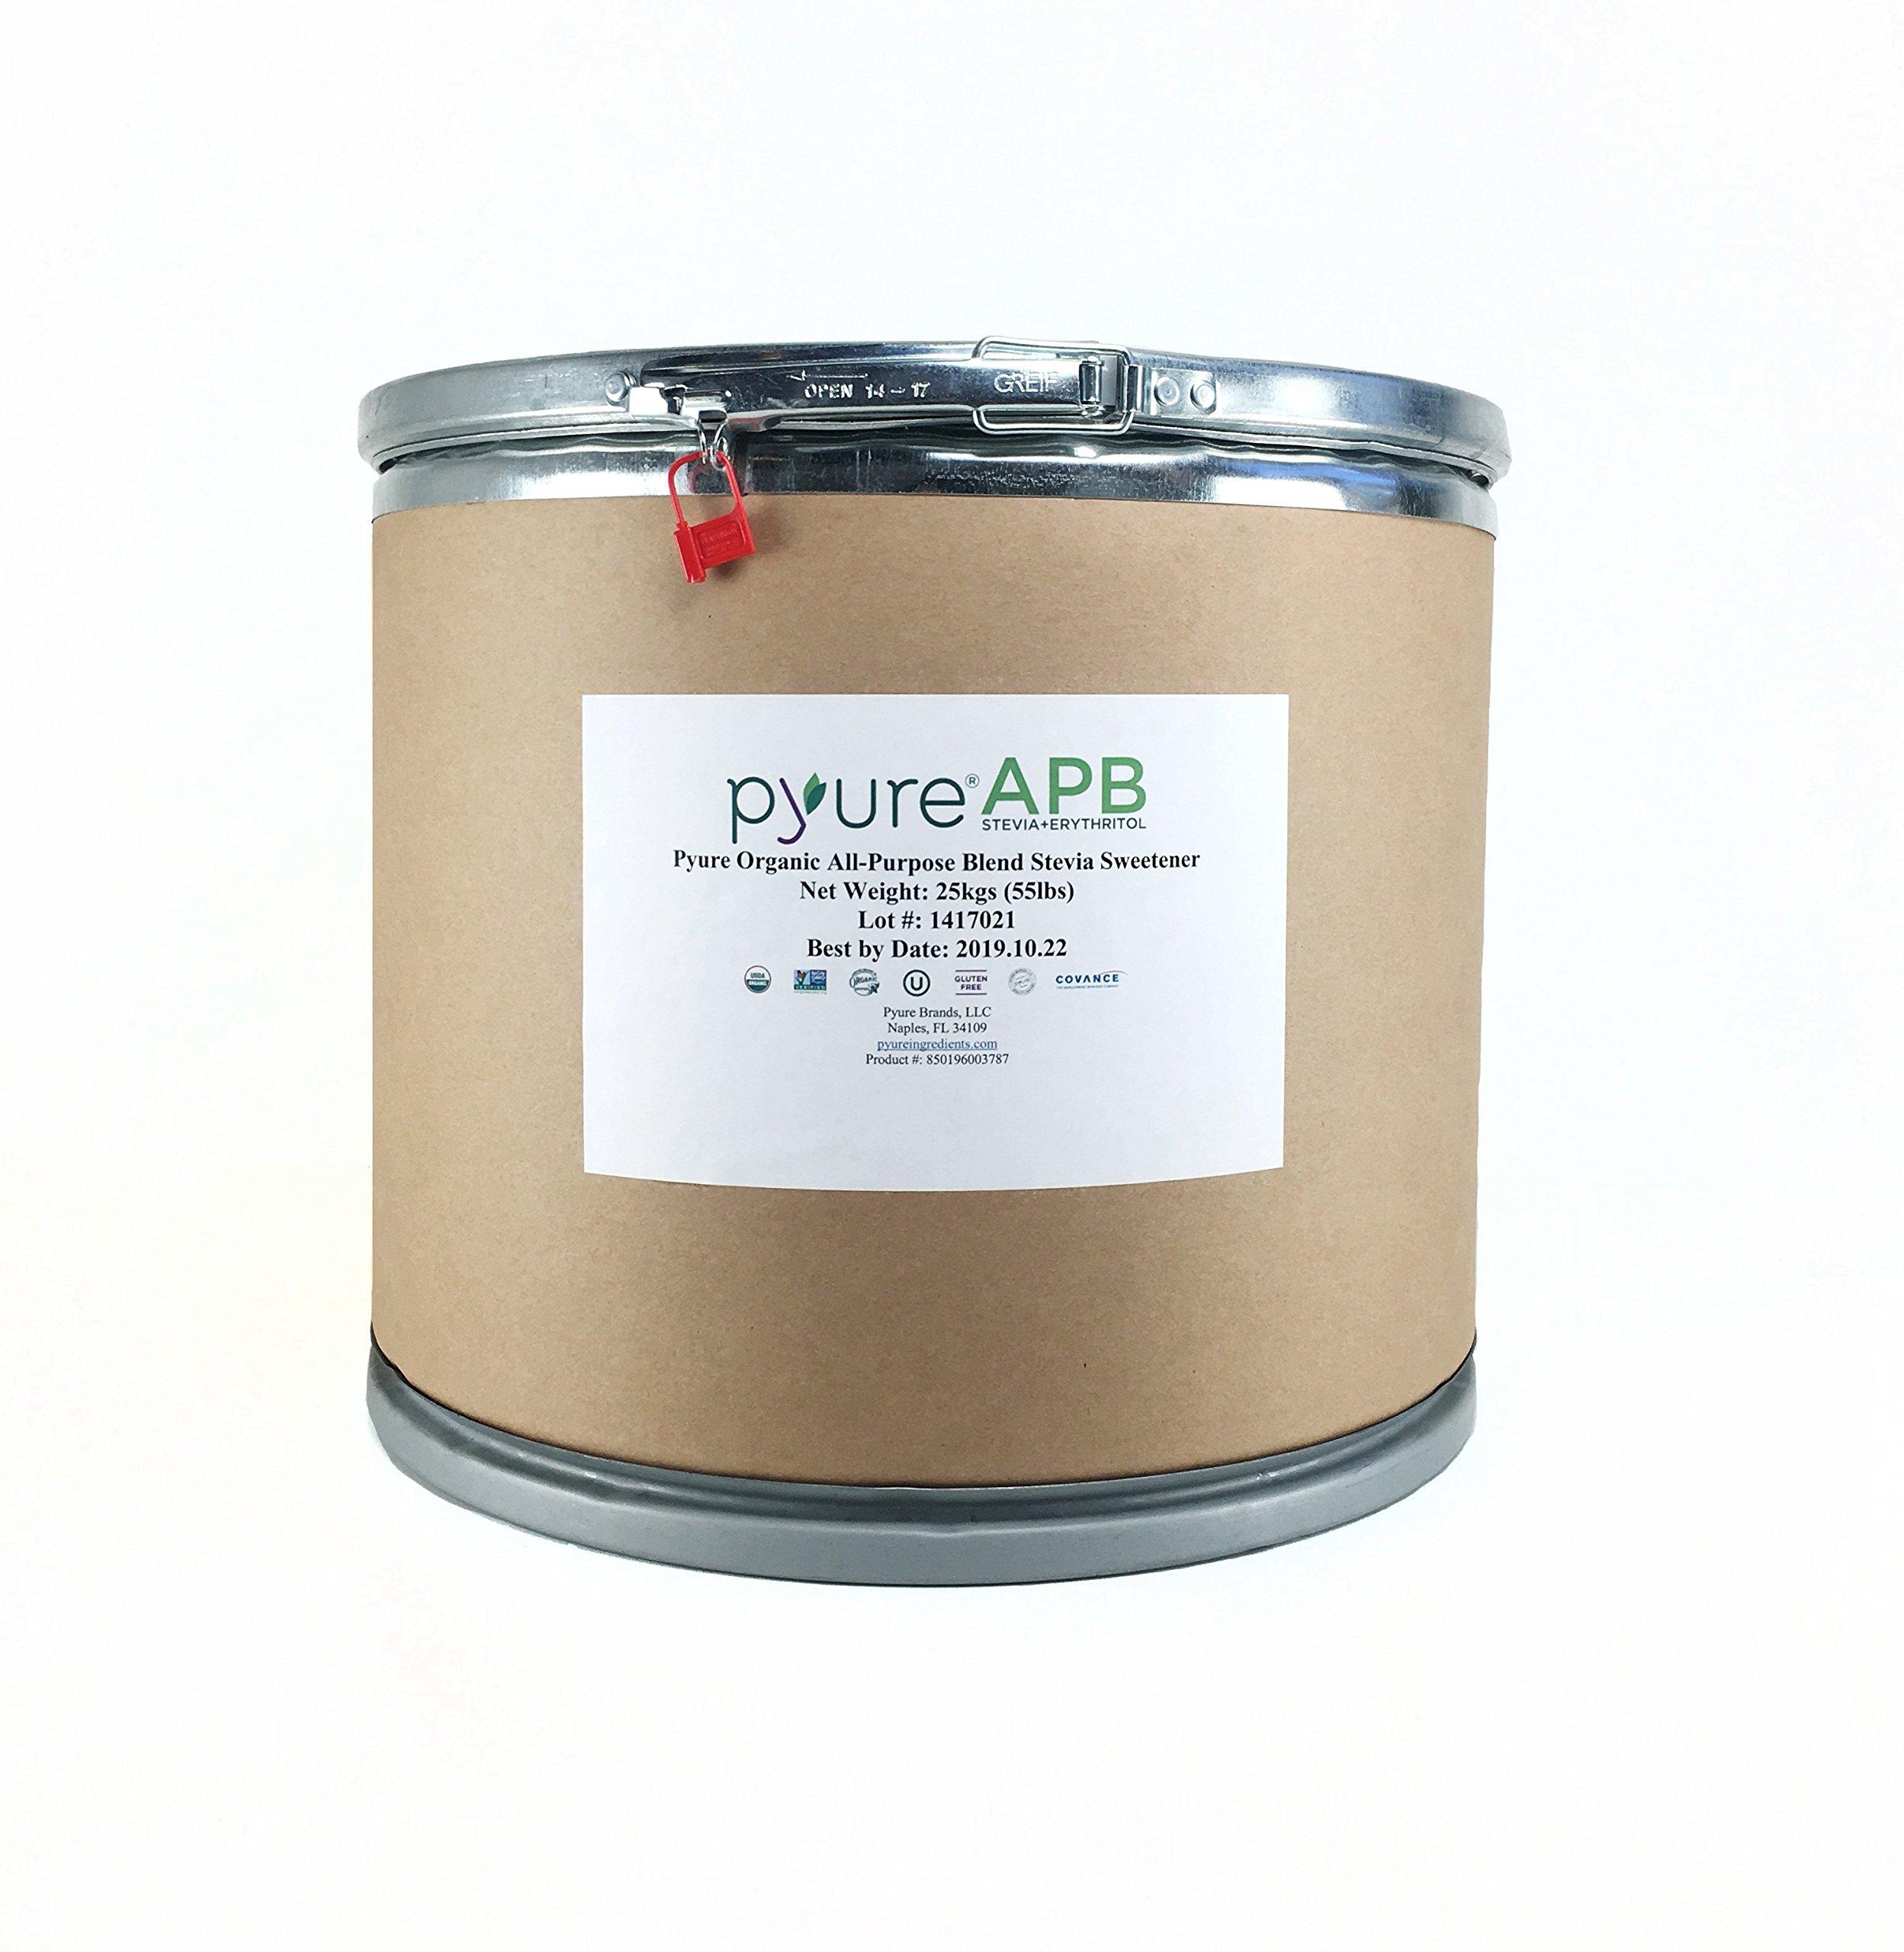 Pyure Organic All-Purpose Blend Stevia Sweetener, Bulk Sugar Substitute, Perfect for Bakery & Restaurant Sugar-Free Sweetening, 55 Pound